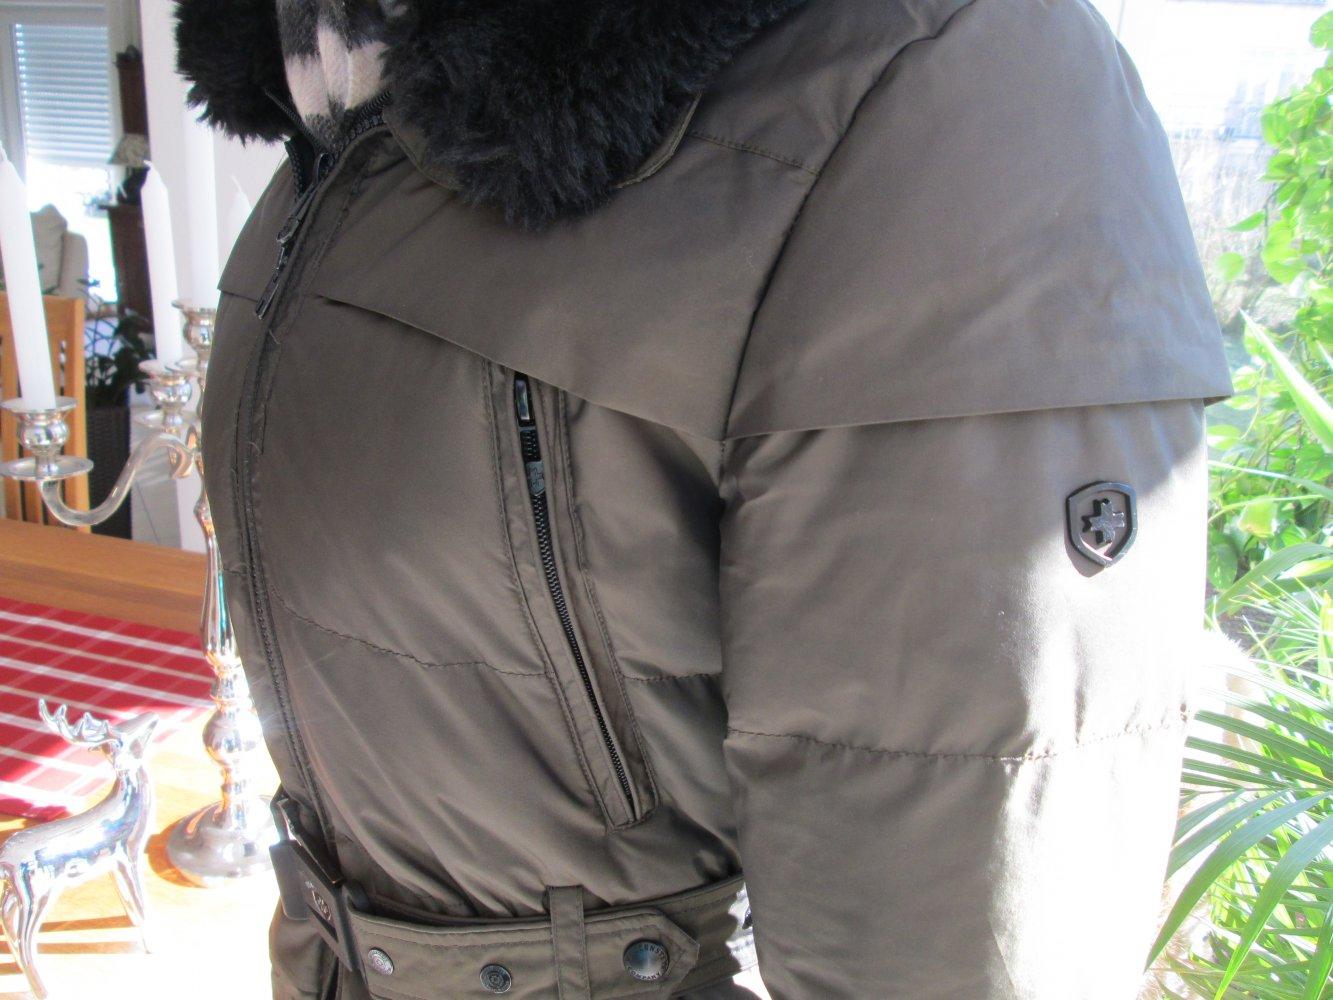 Wellensteyn Tivoli Jacke Parker Gr. XS 34 Winterjacke Fell Pelz Tivana olive khaki